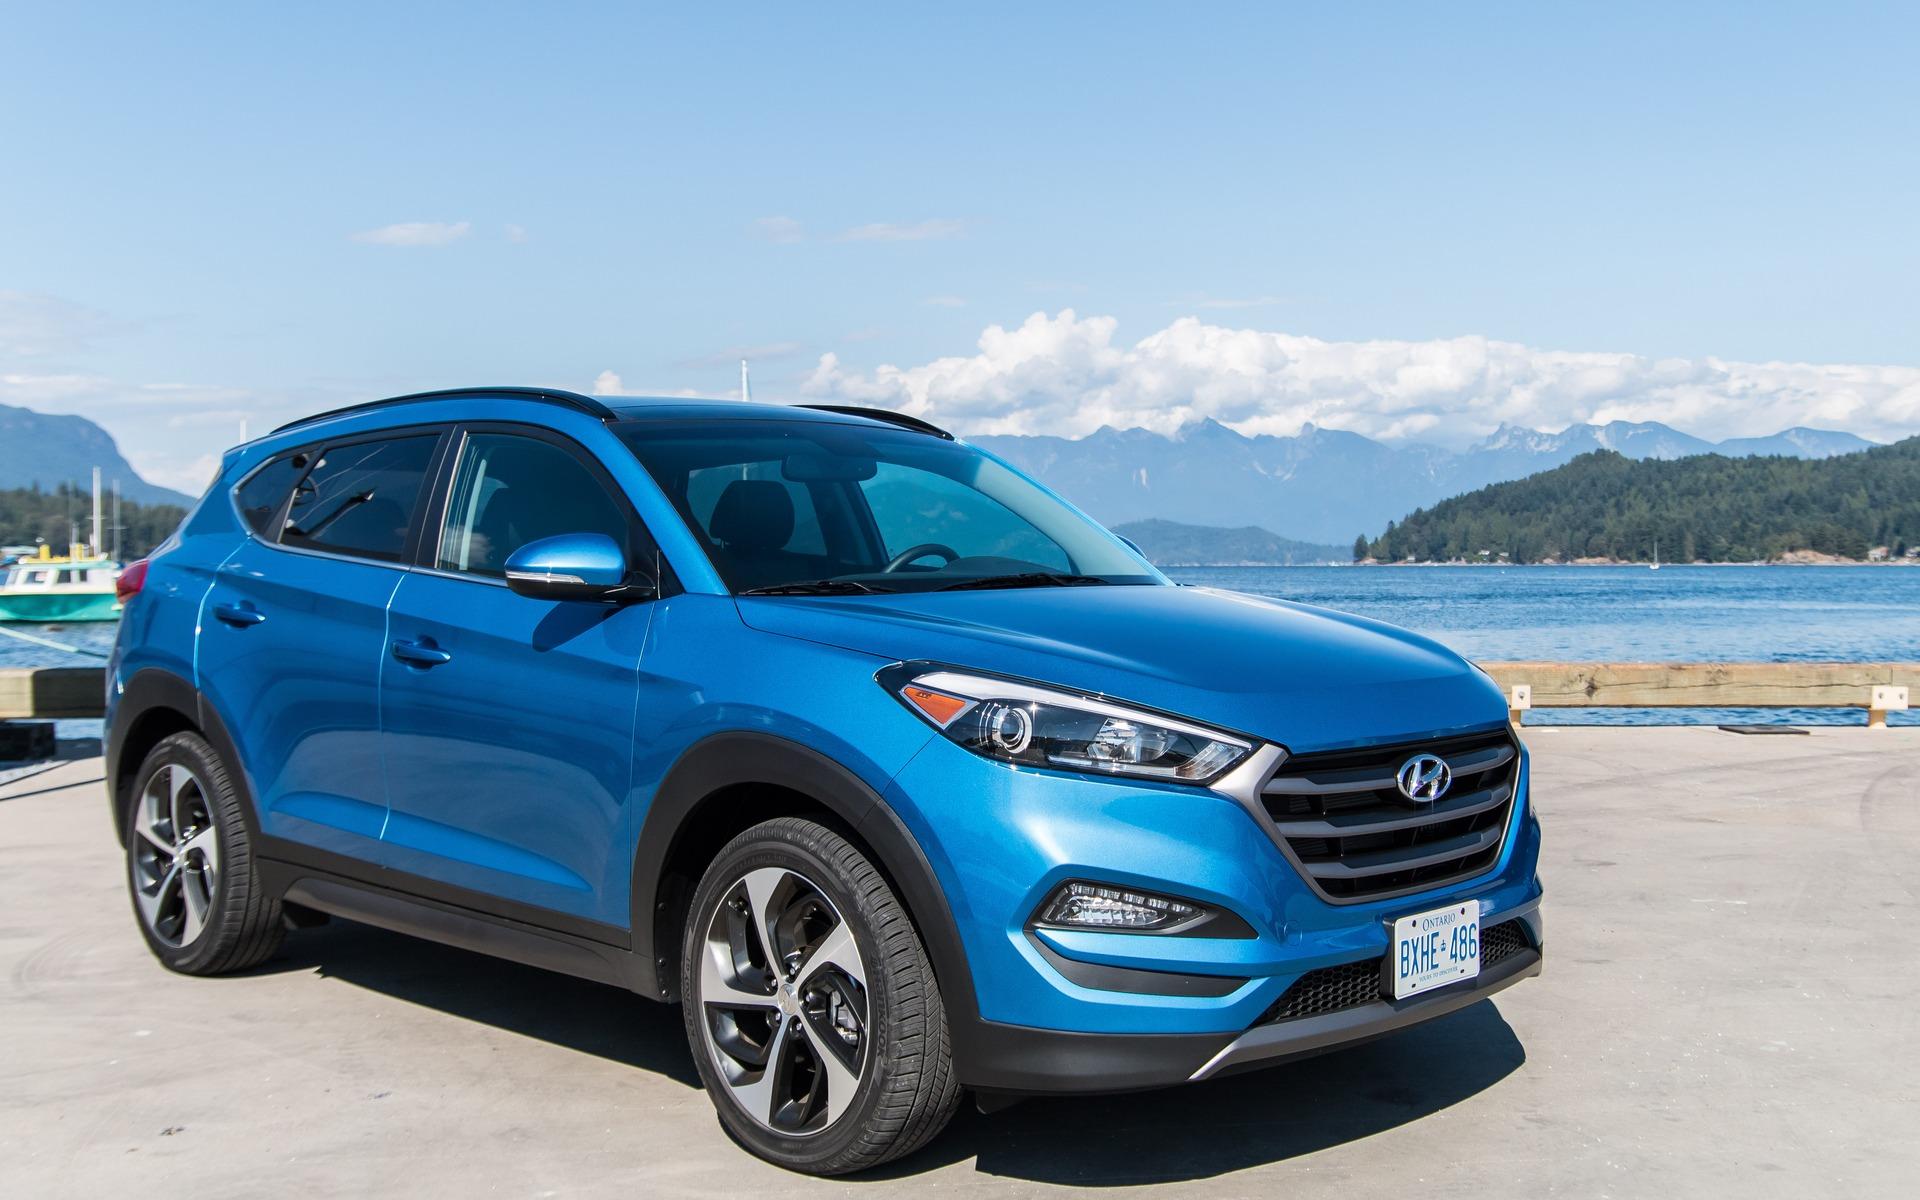 2016 Hyundai Tucson Definitely More Competitive 19 54